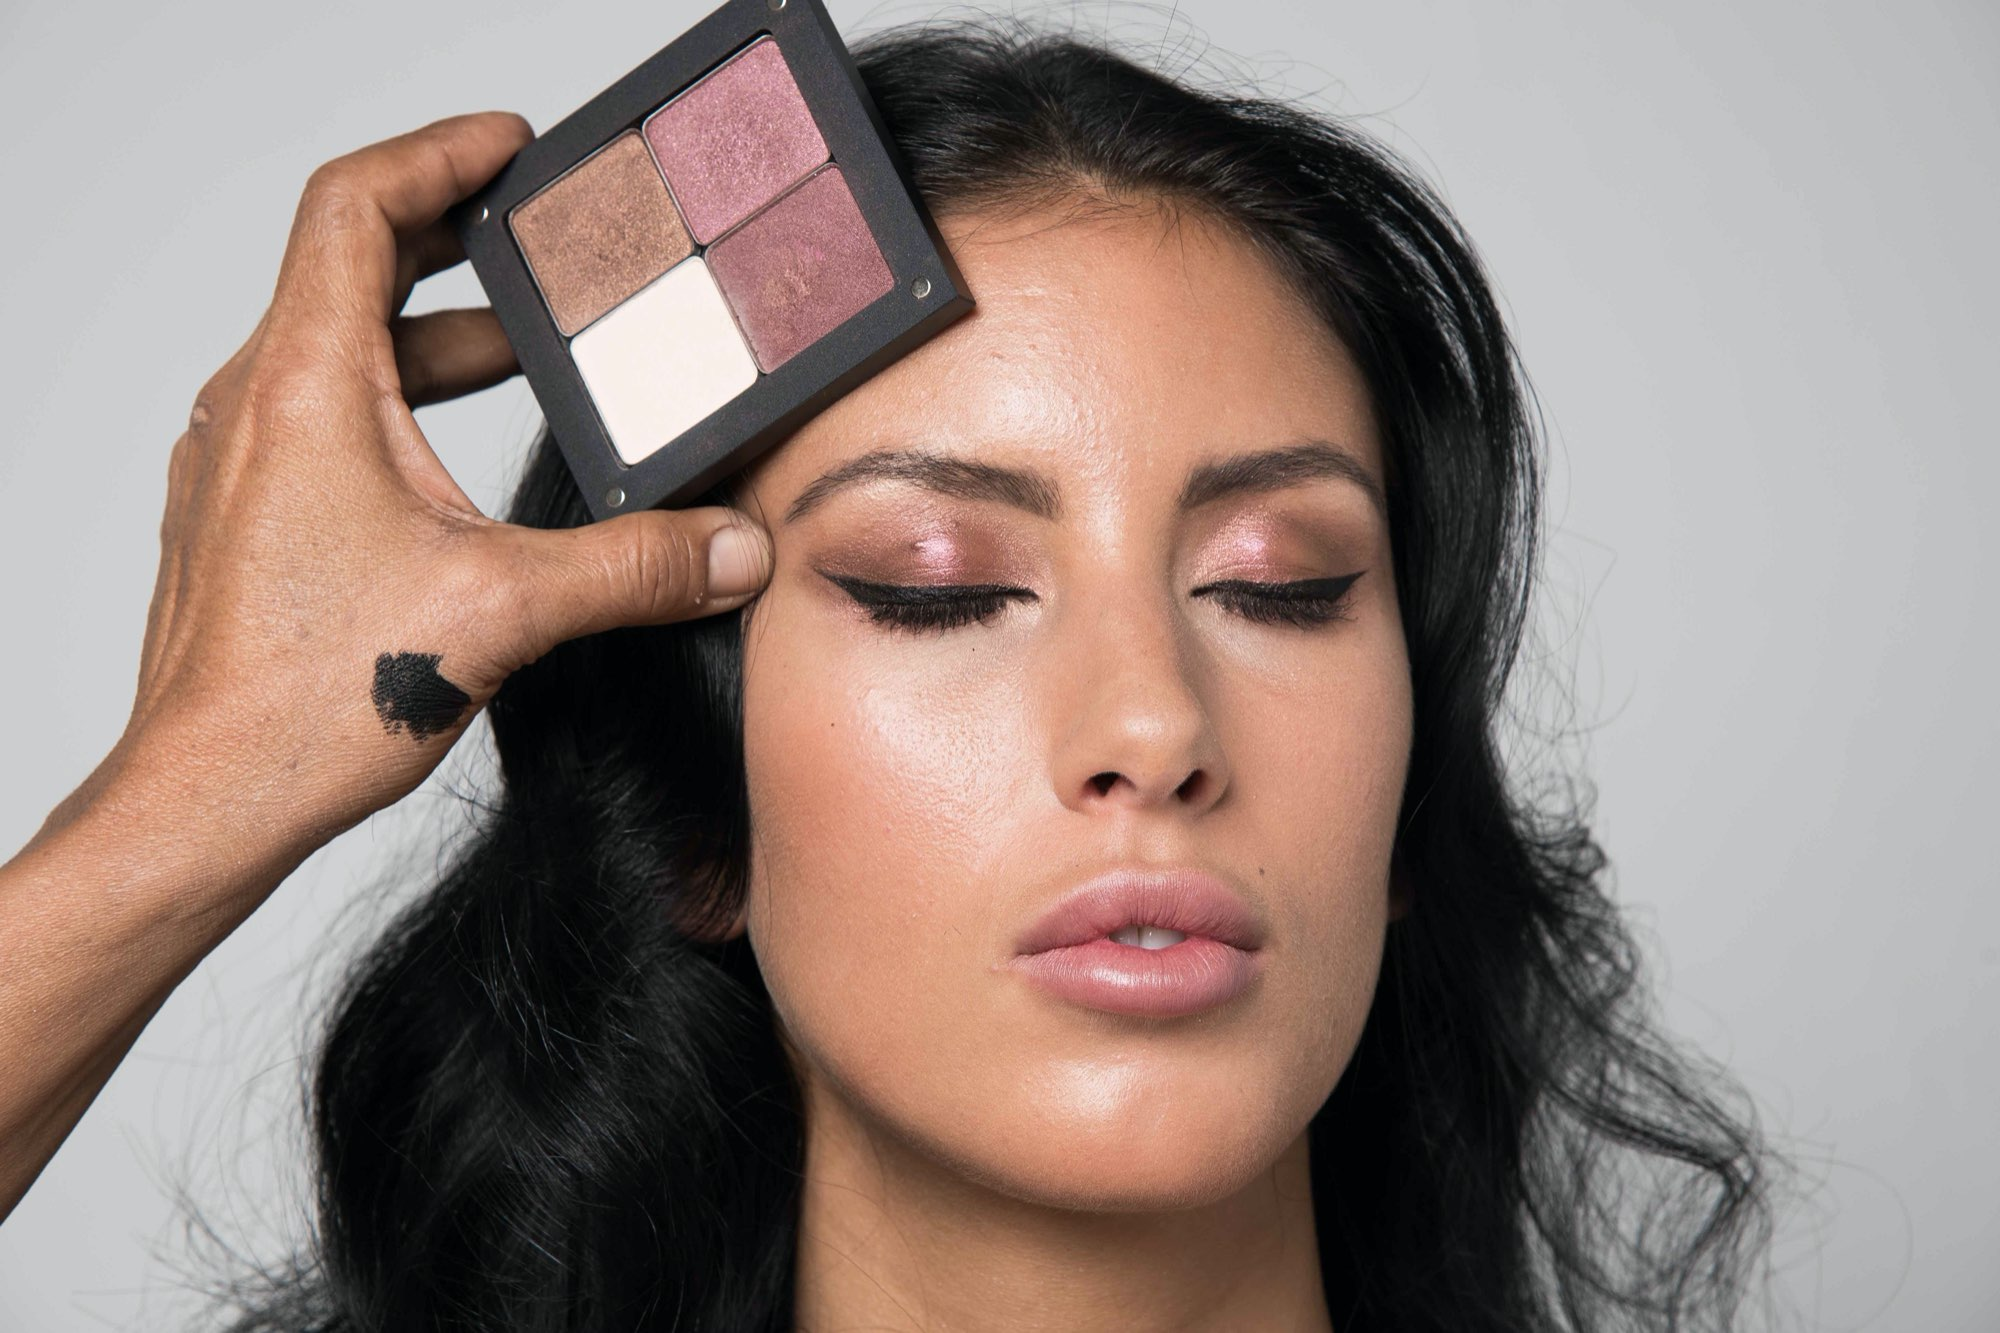 Der Klassiker: rote Lippen - der-klassiker--rote-lippen-ID14410-1.jpeg?v=1583327741